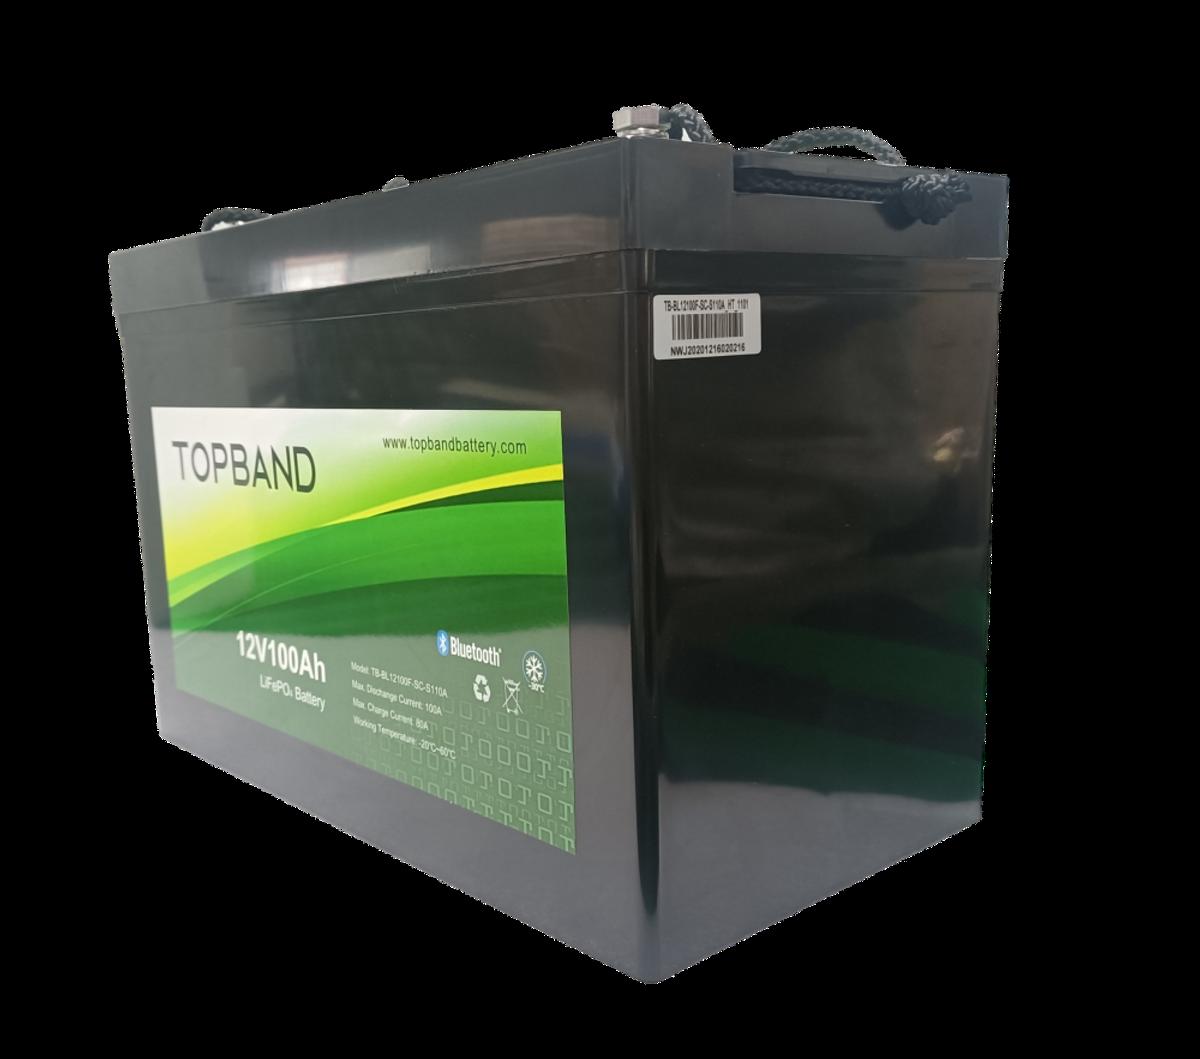 TOPBAND Lithium HEAT PRO - 12V 100AH - 150 BMS Bluetooth